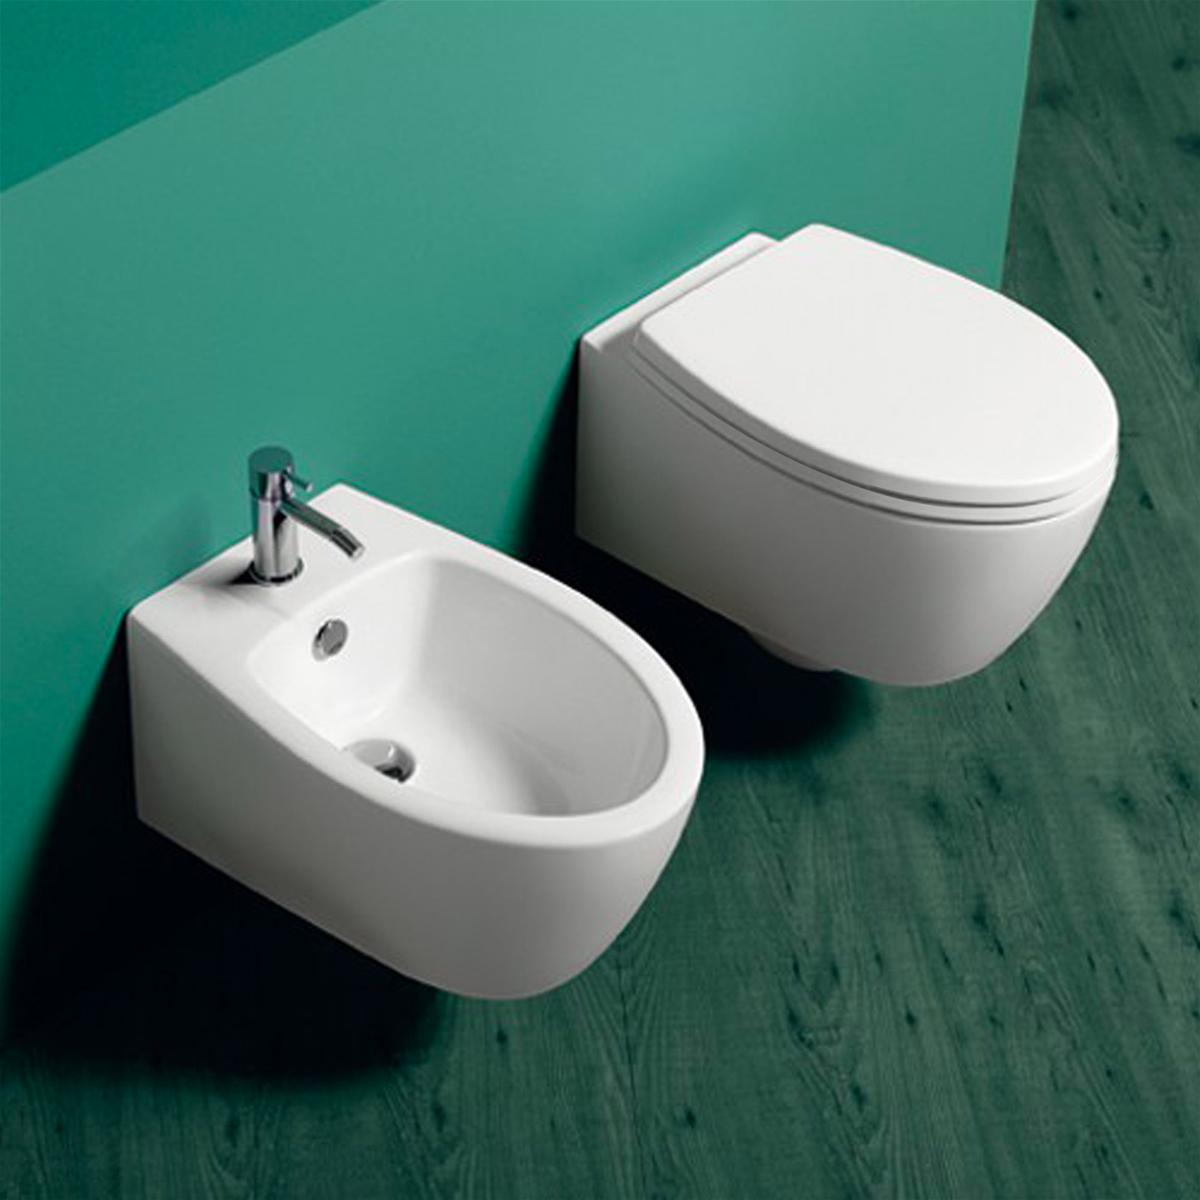 Sanitari sospesi vaso wc bidet e sedile serie simas lft for Sanitari sospesi